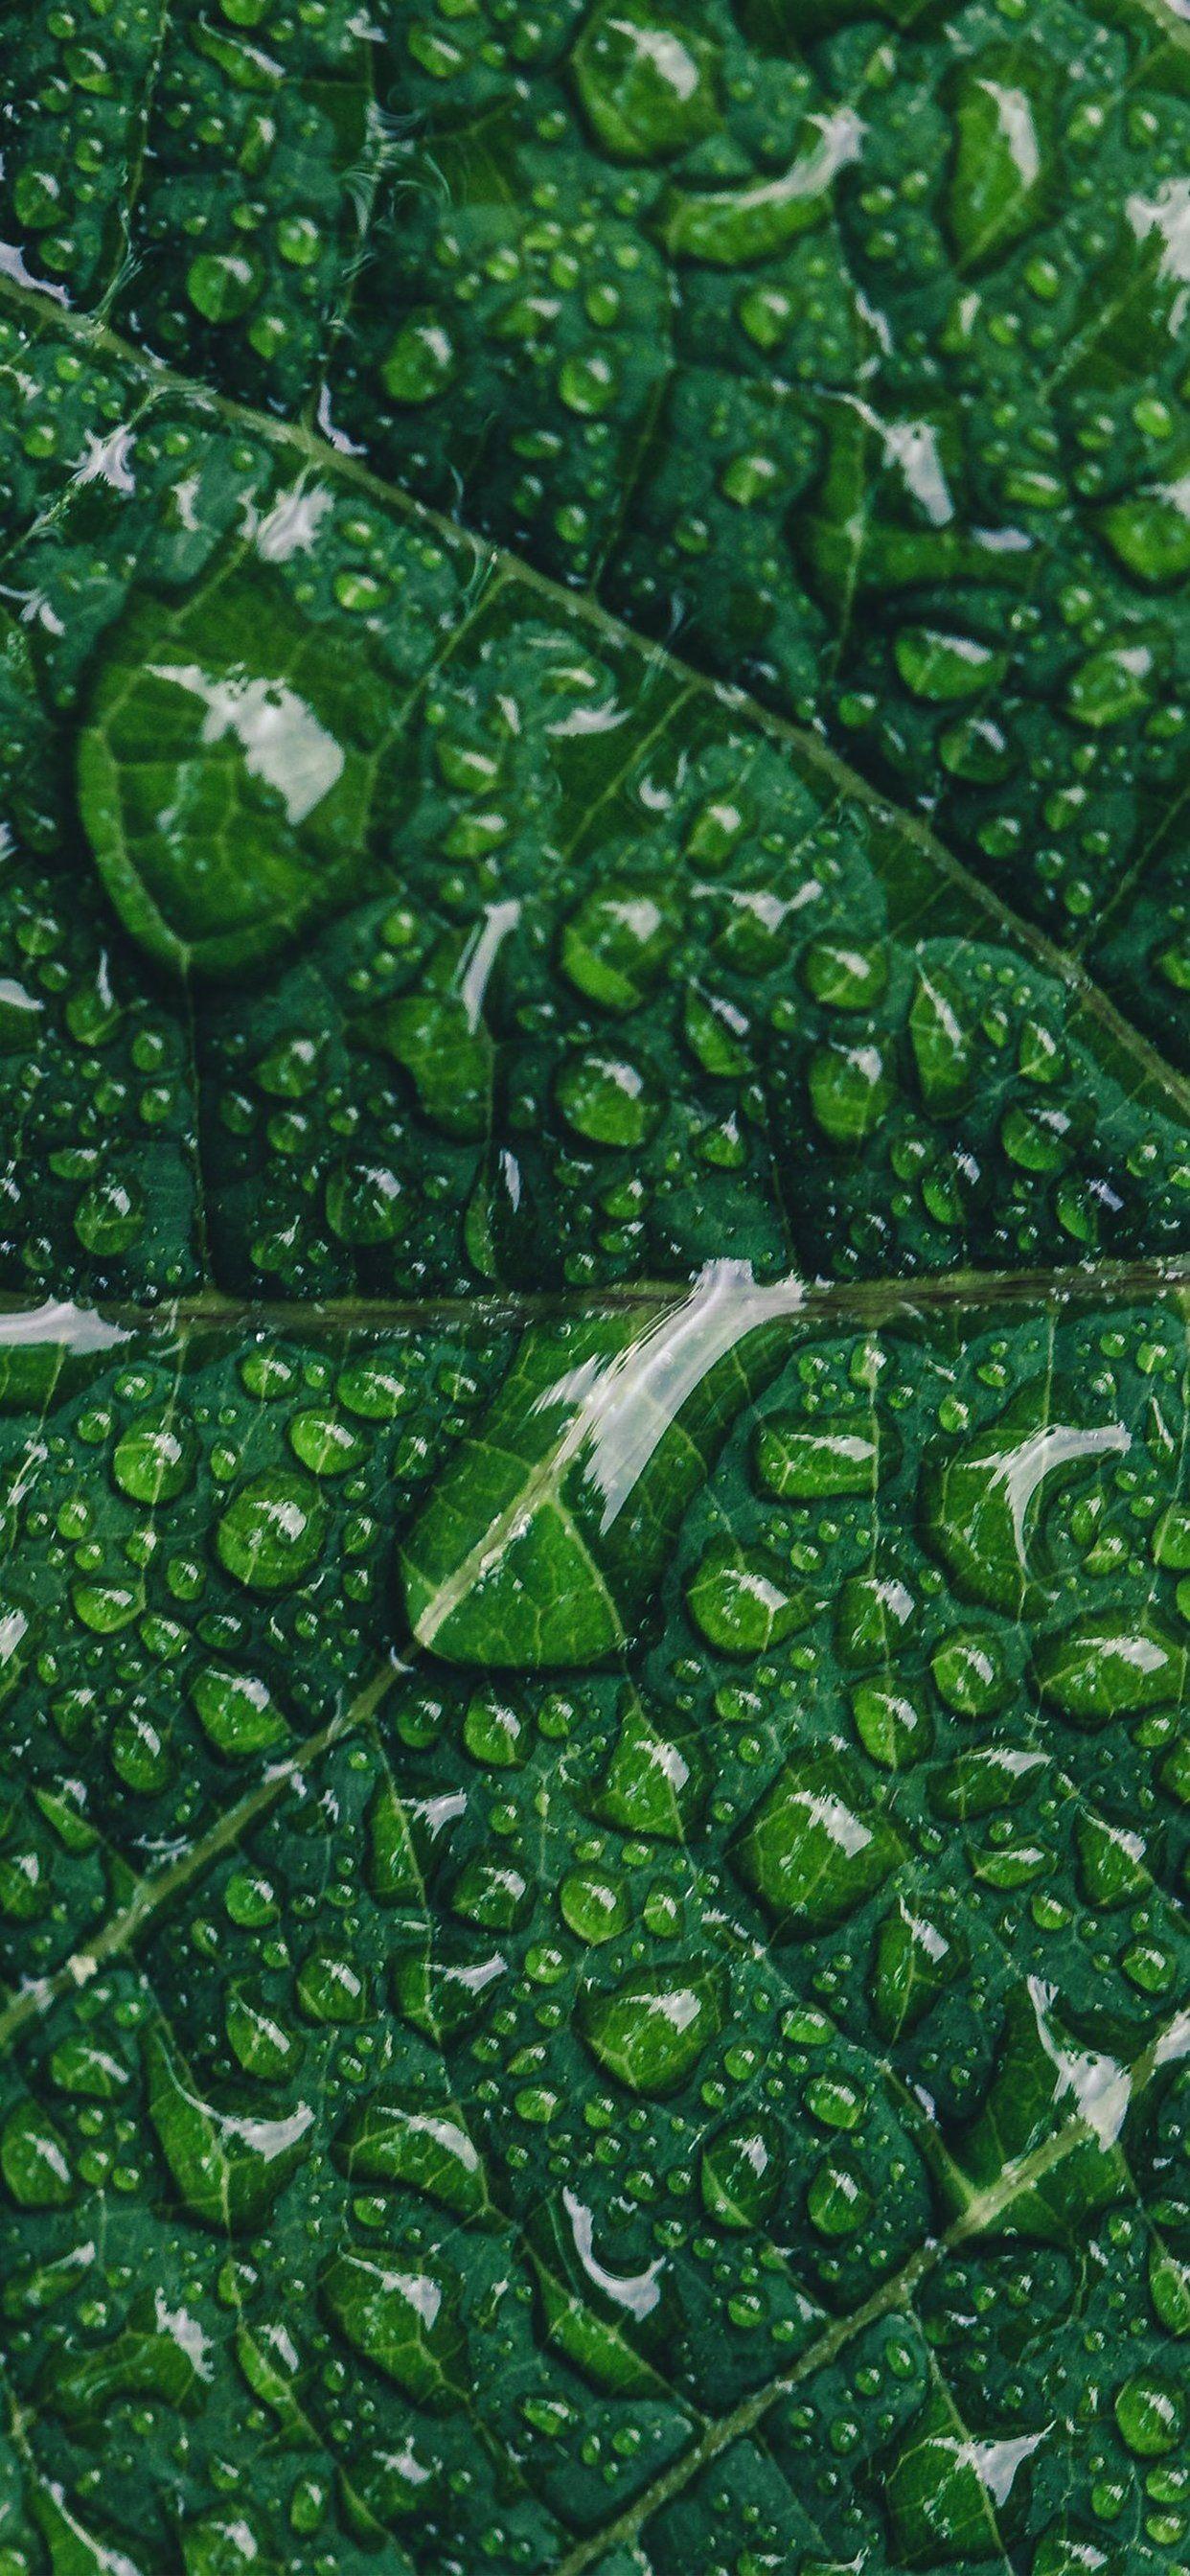 Nature Dark Green Aesthetic Wallpapers - Wallpaper Cave